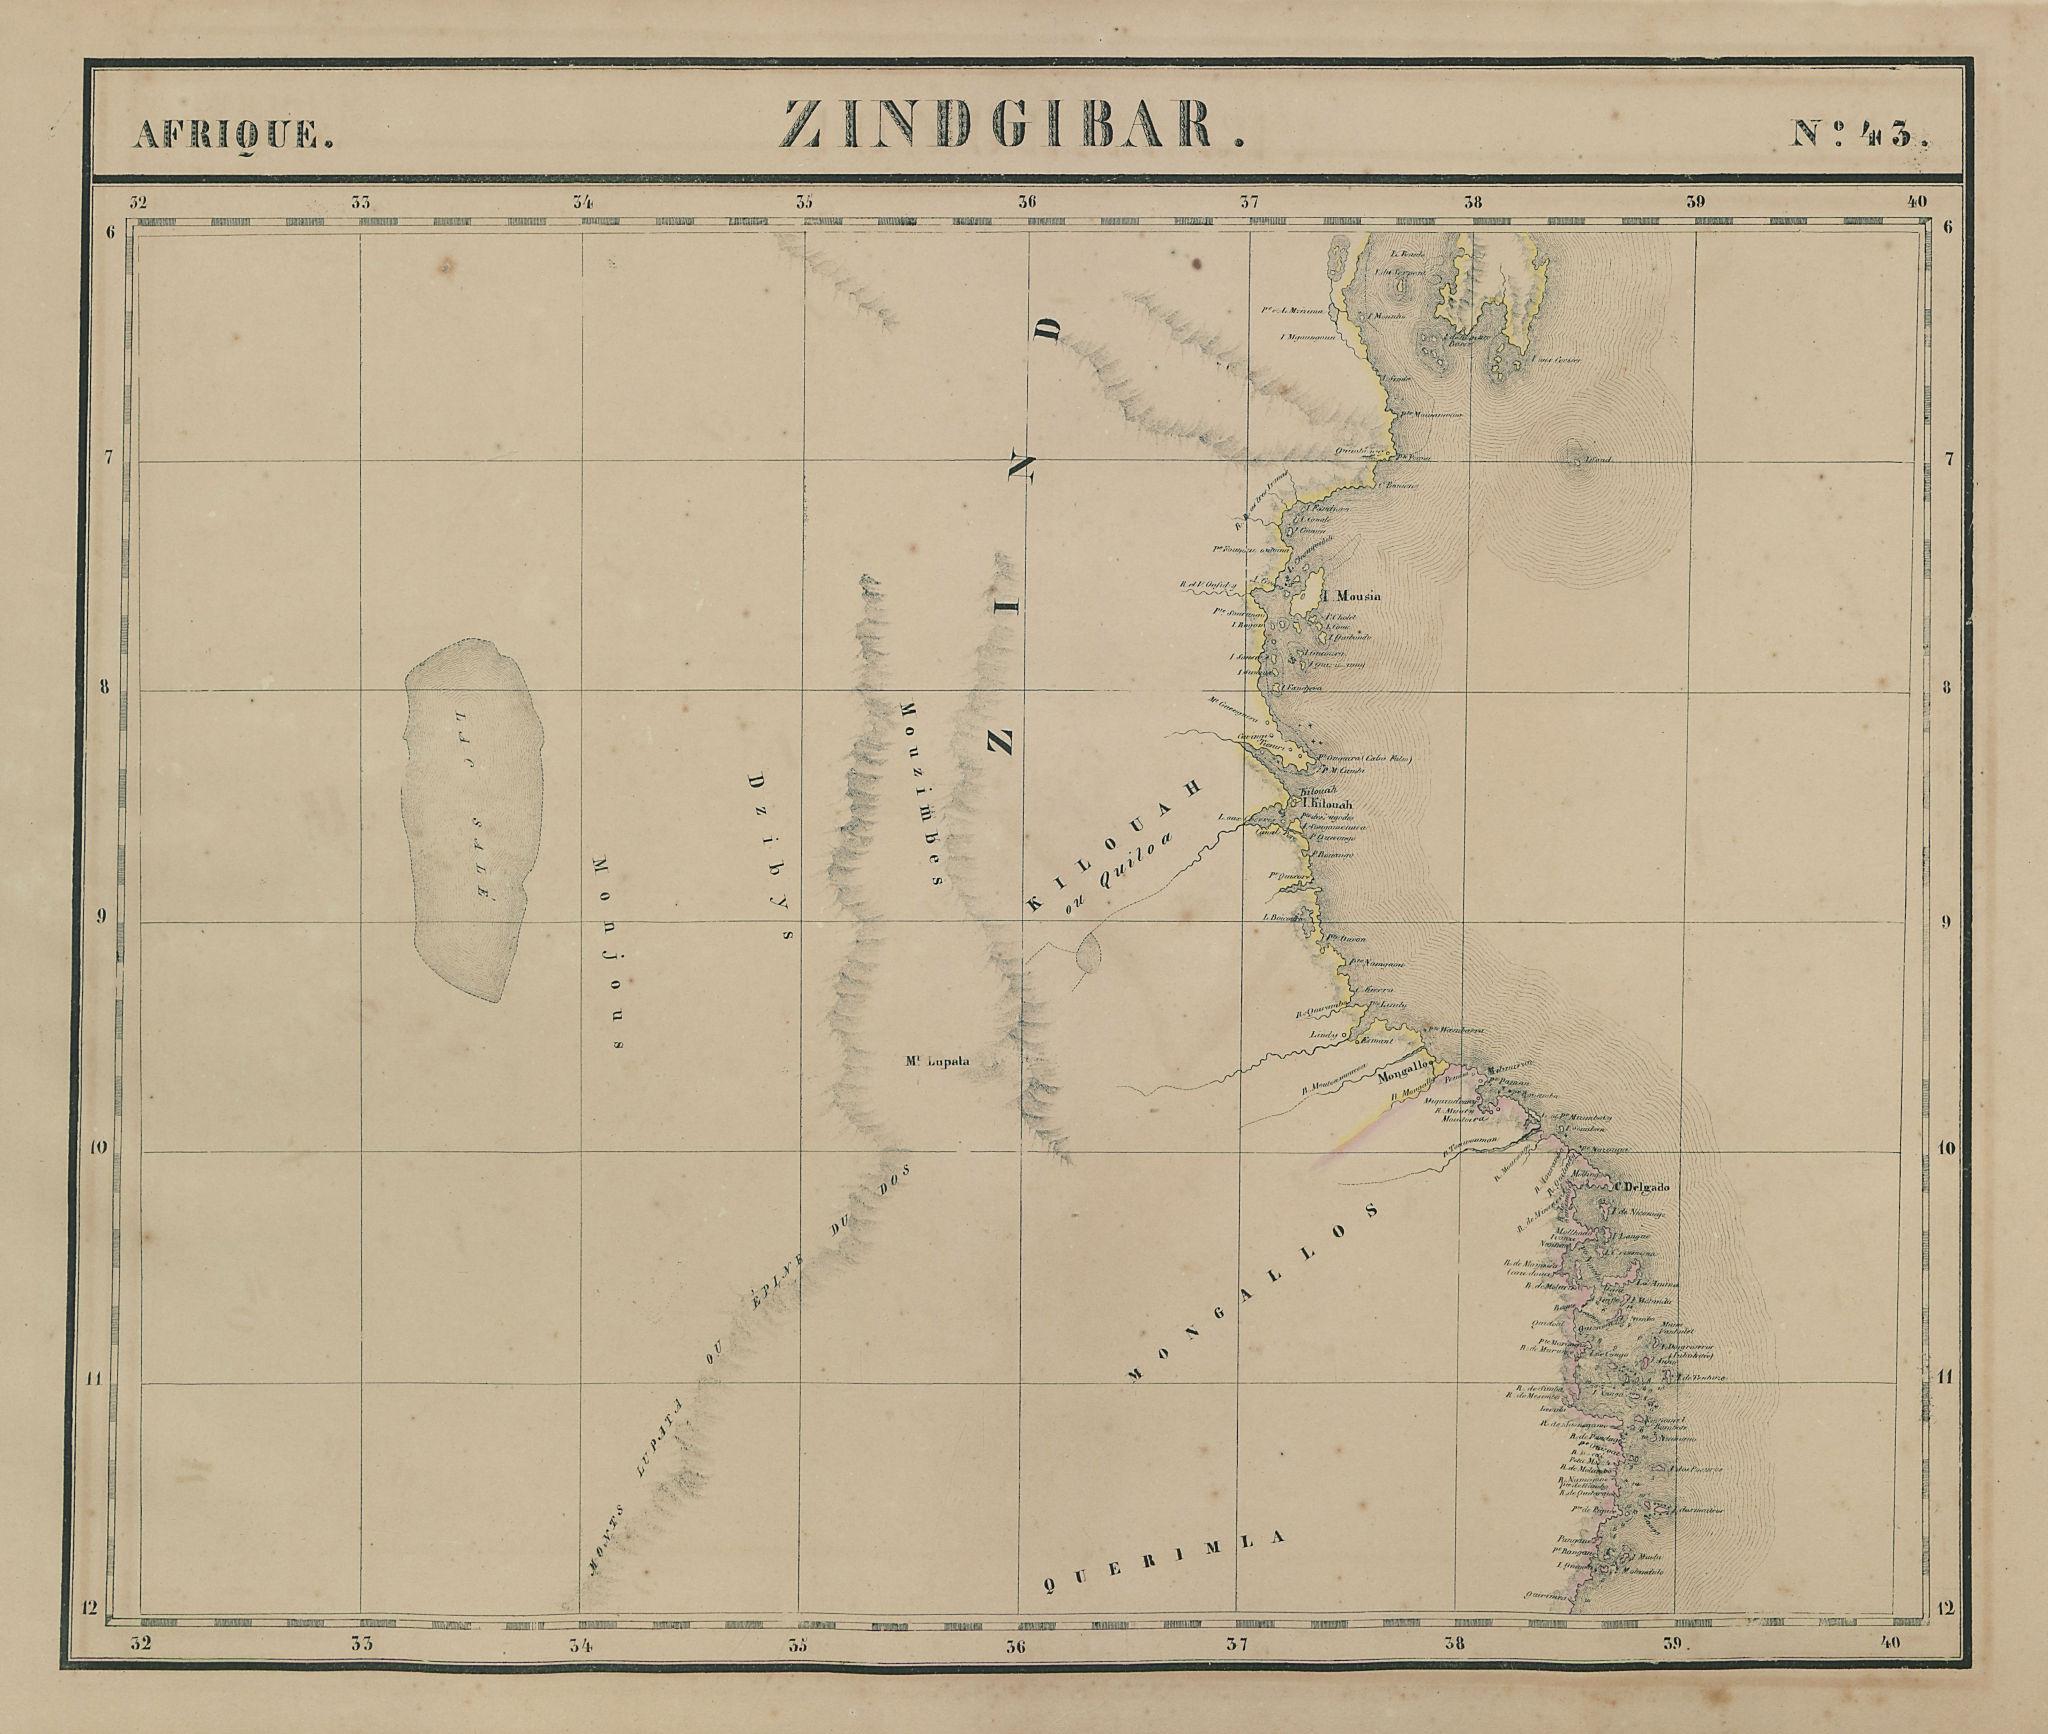 Afrique. Zindgibar #43. Tanzania & northern Mozambique. VANDERMAELEN 1827 map